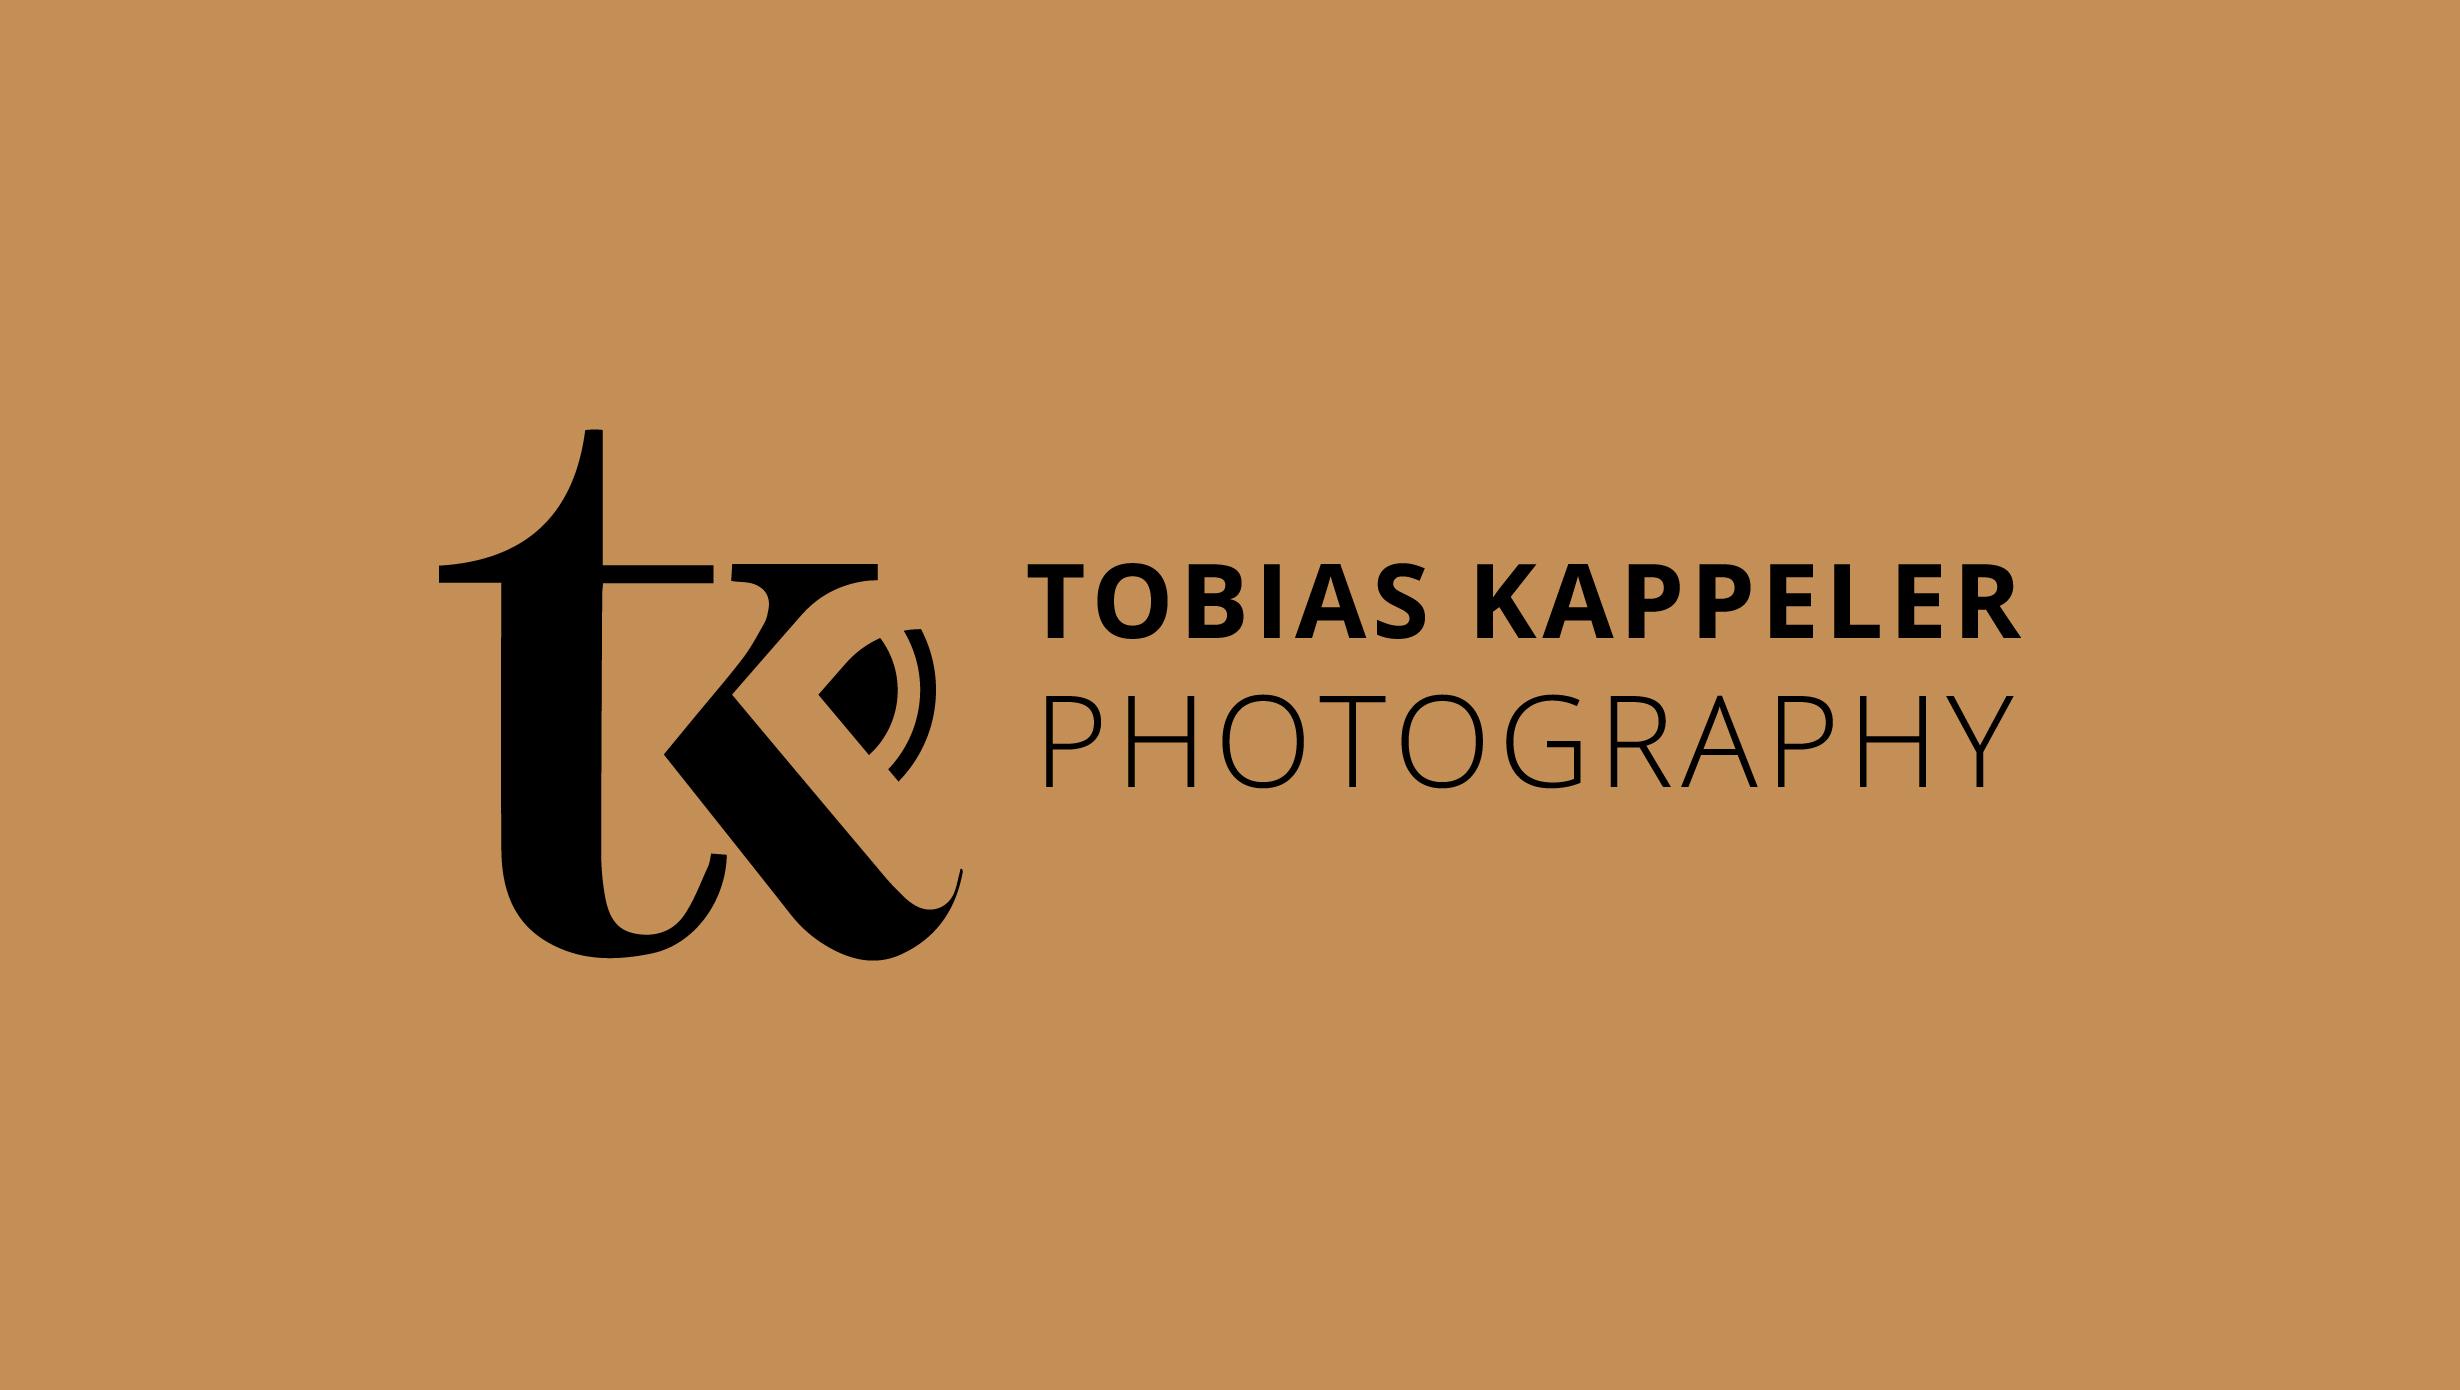 Tobias Kappeler Logo Design